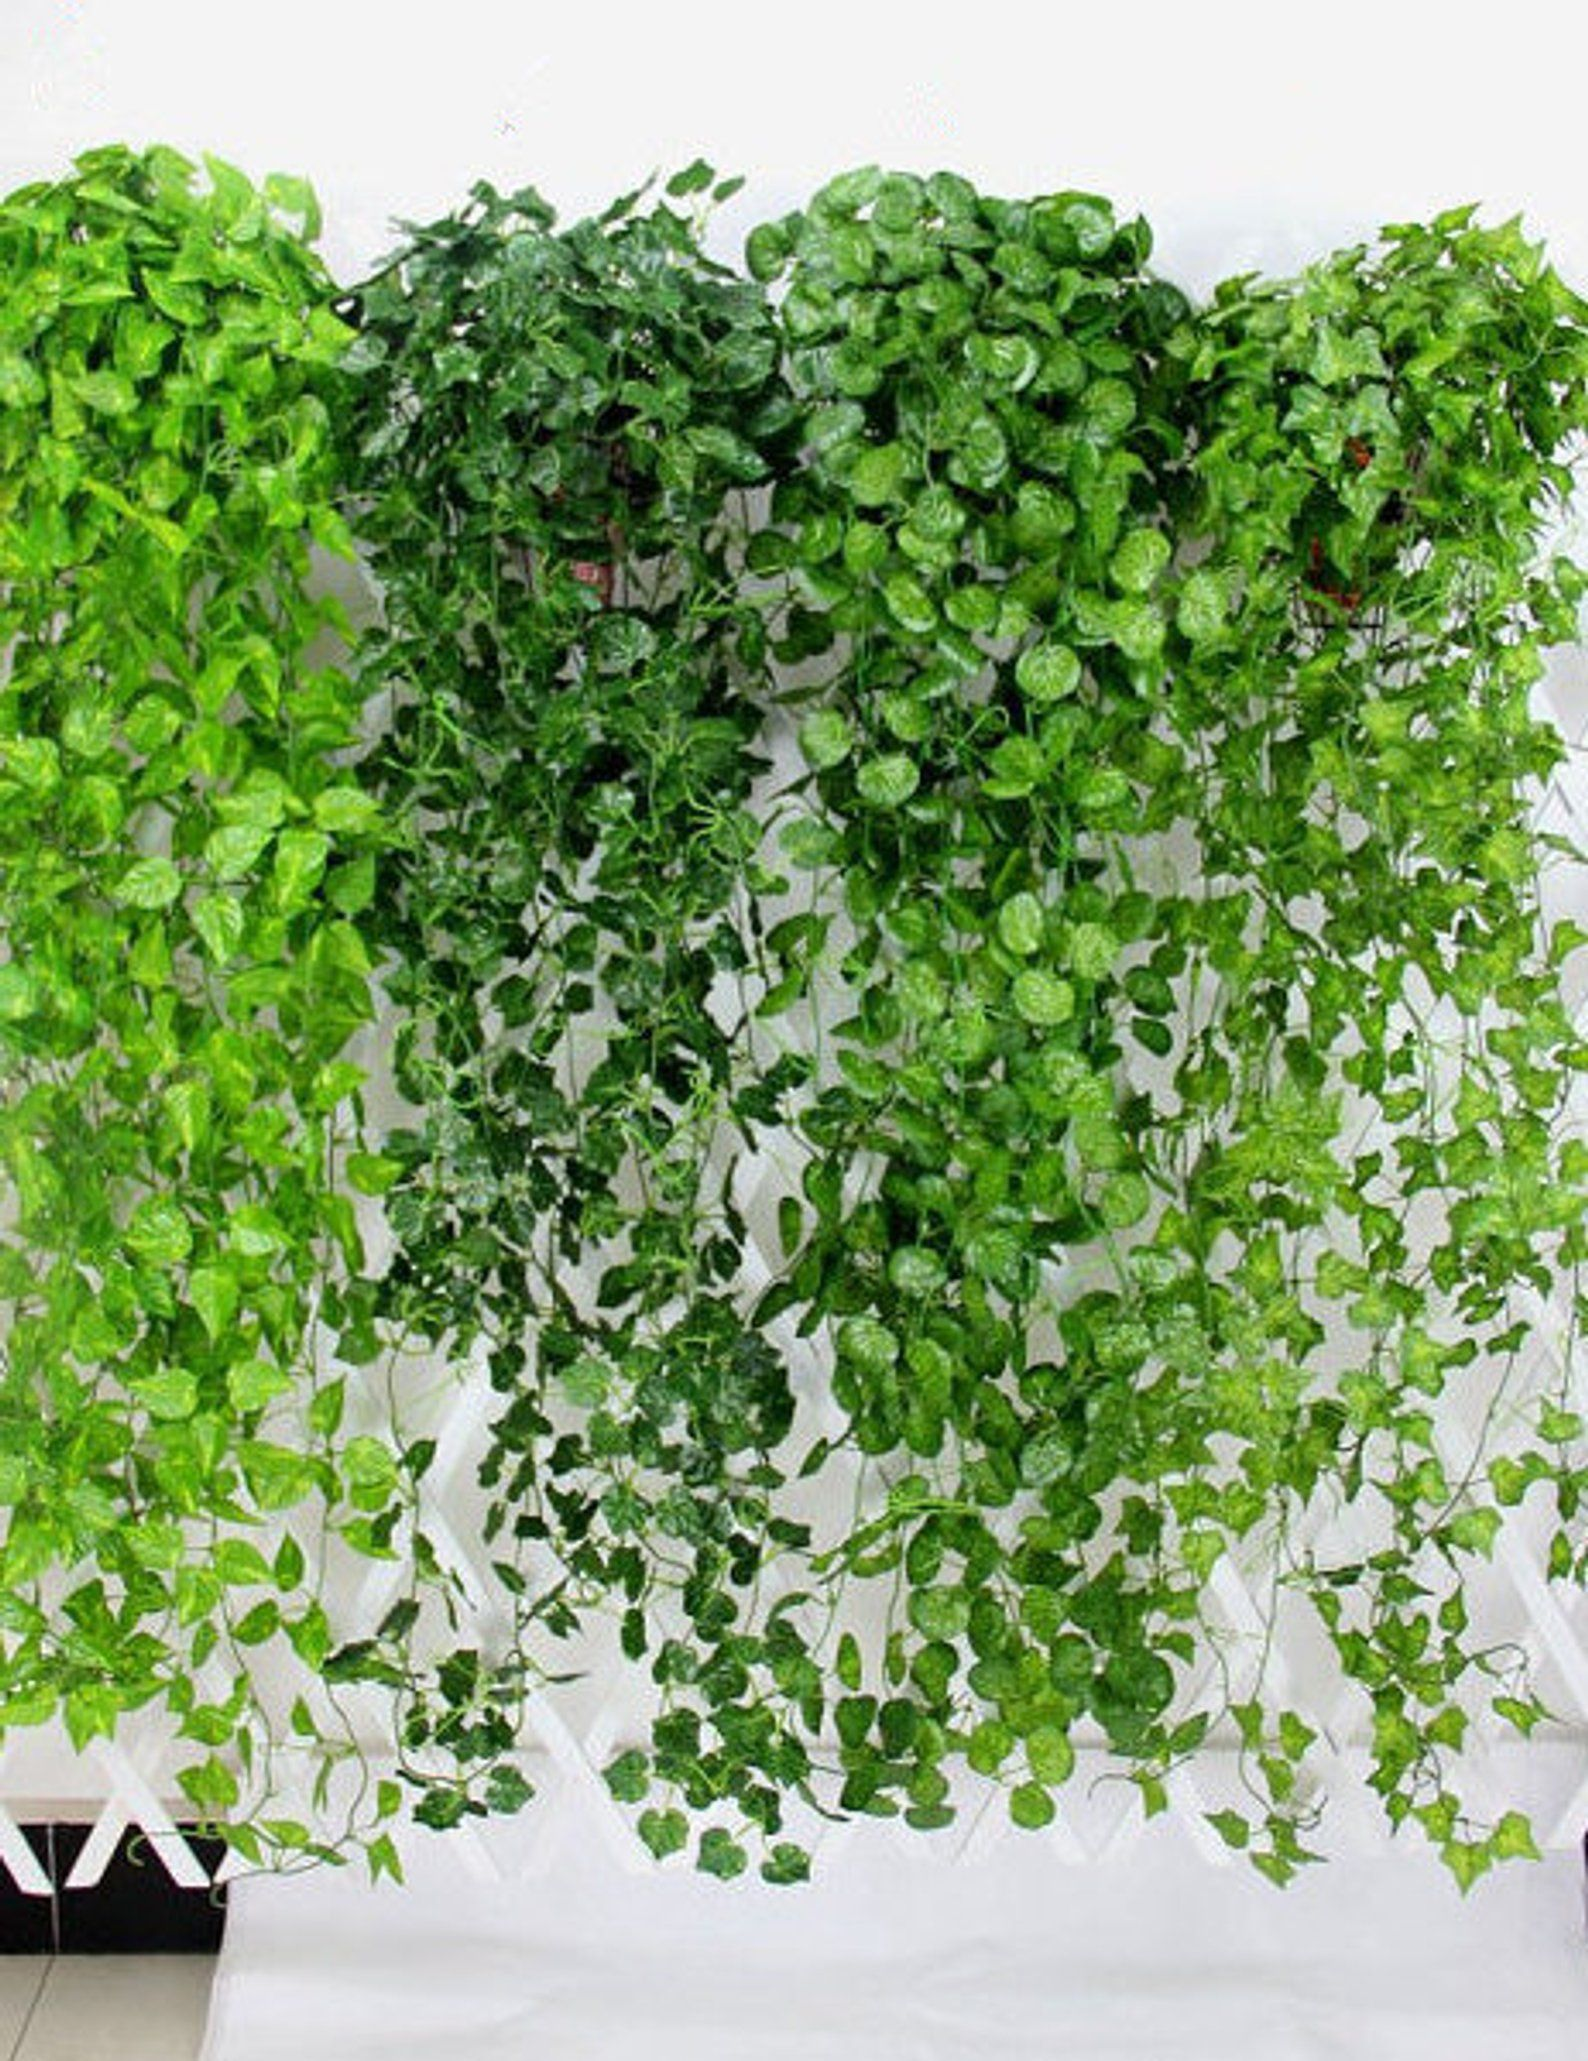 Artificial Fake Hanging Flower Vine Plant Home Garden Decoration In//Outdoor N3